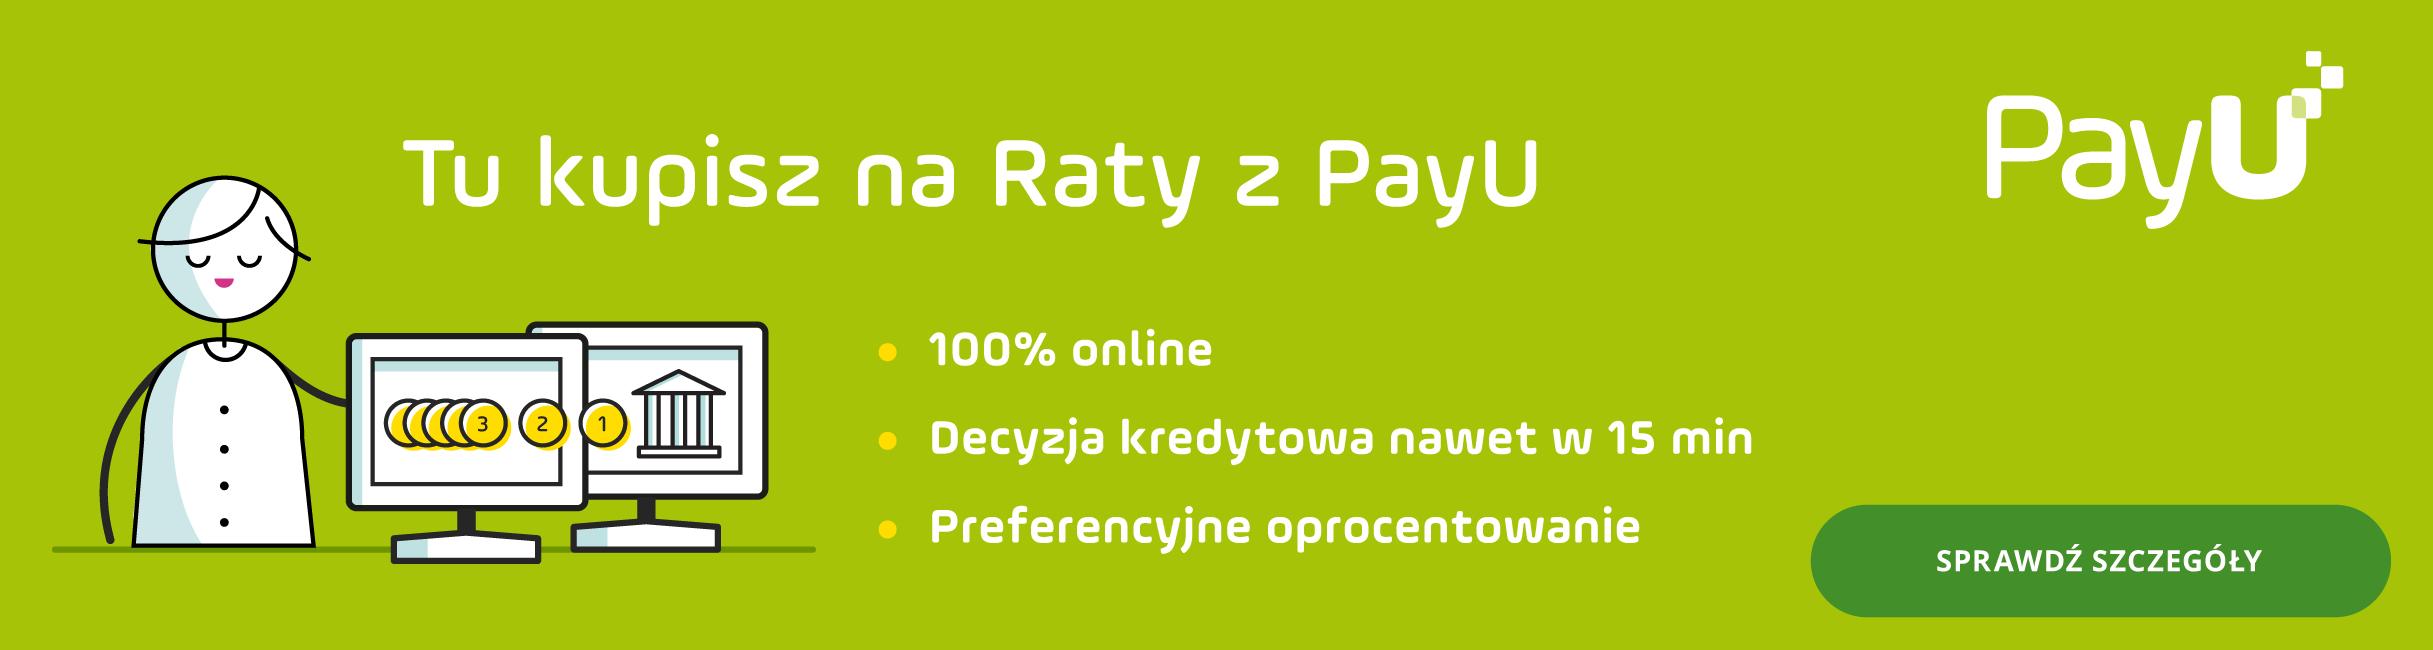 raty PAYU - BP online